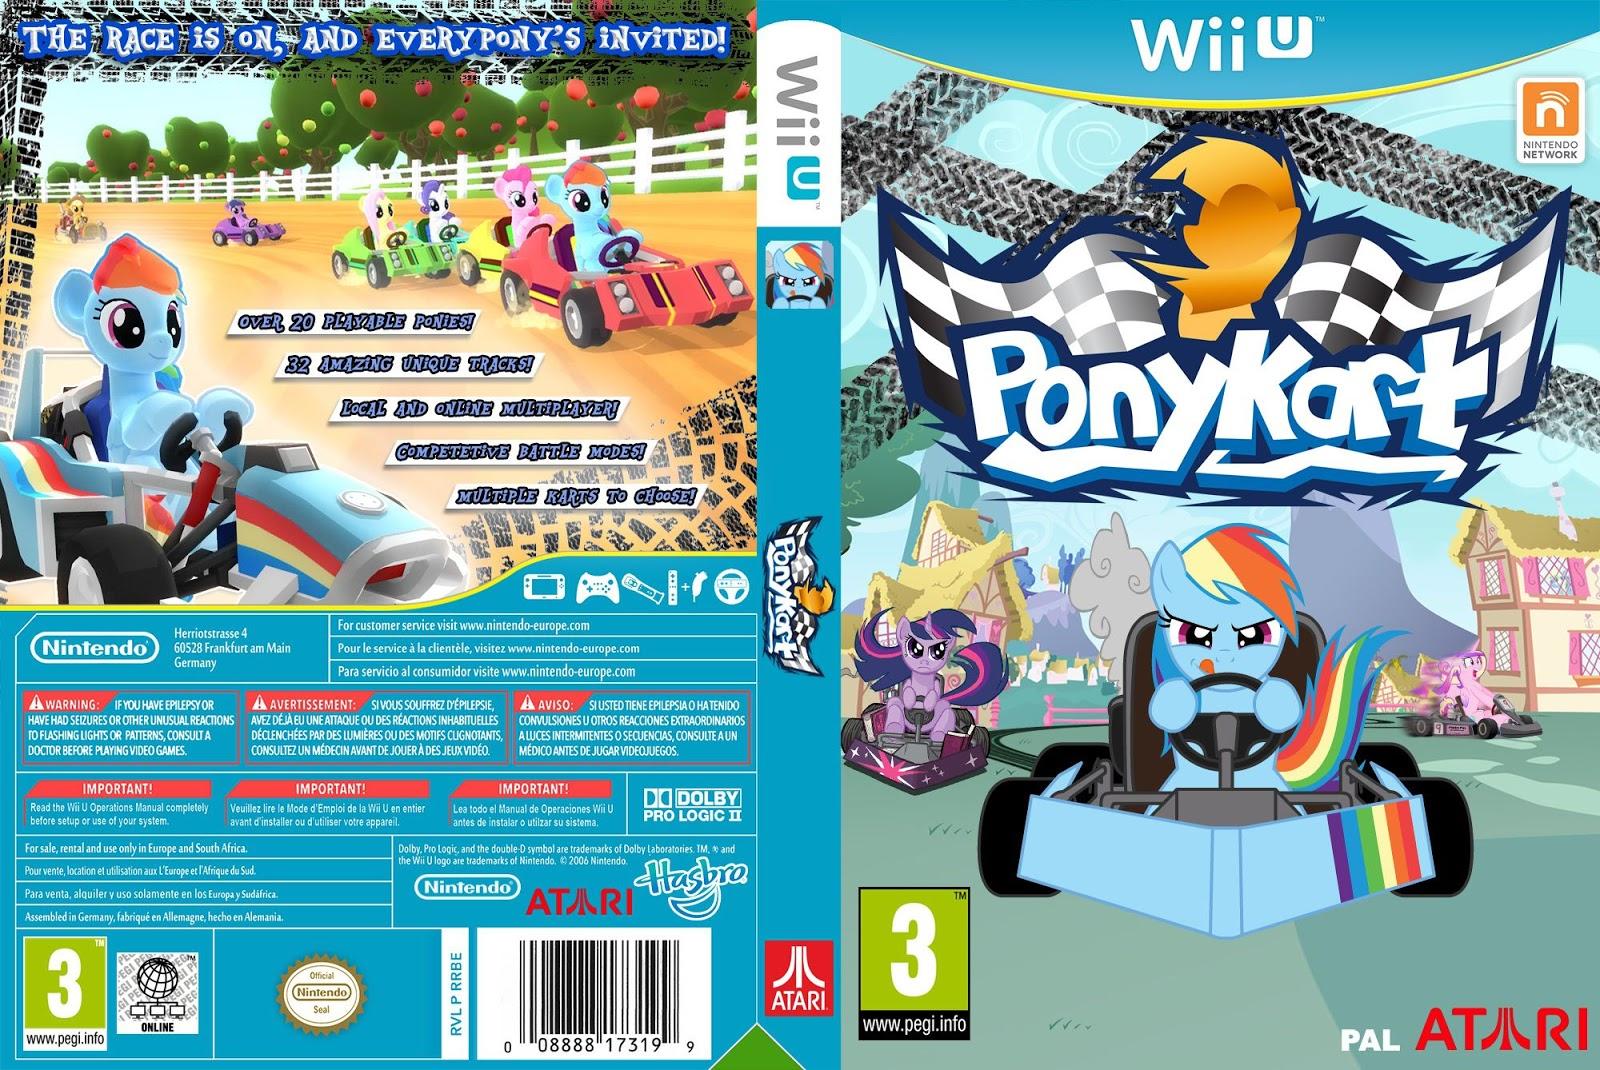 Capa Ponykart Wii U